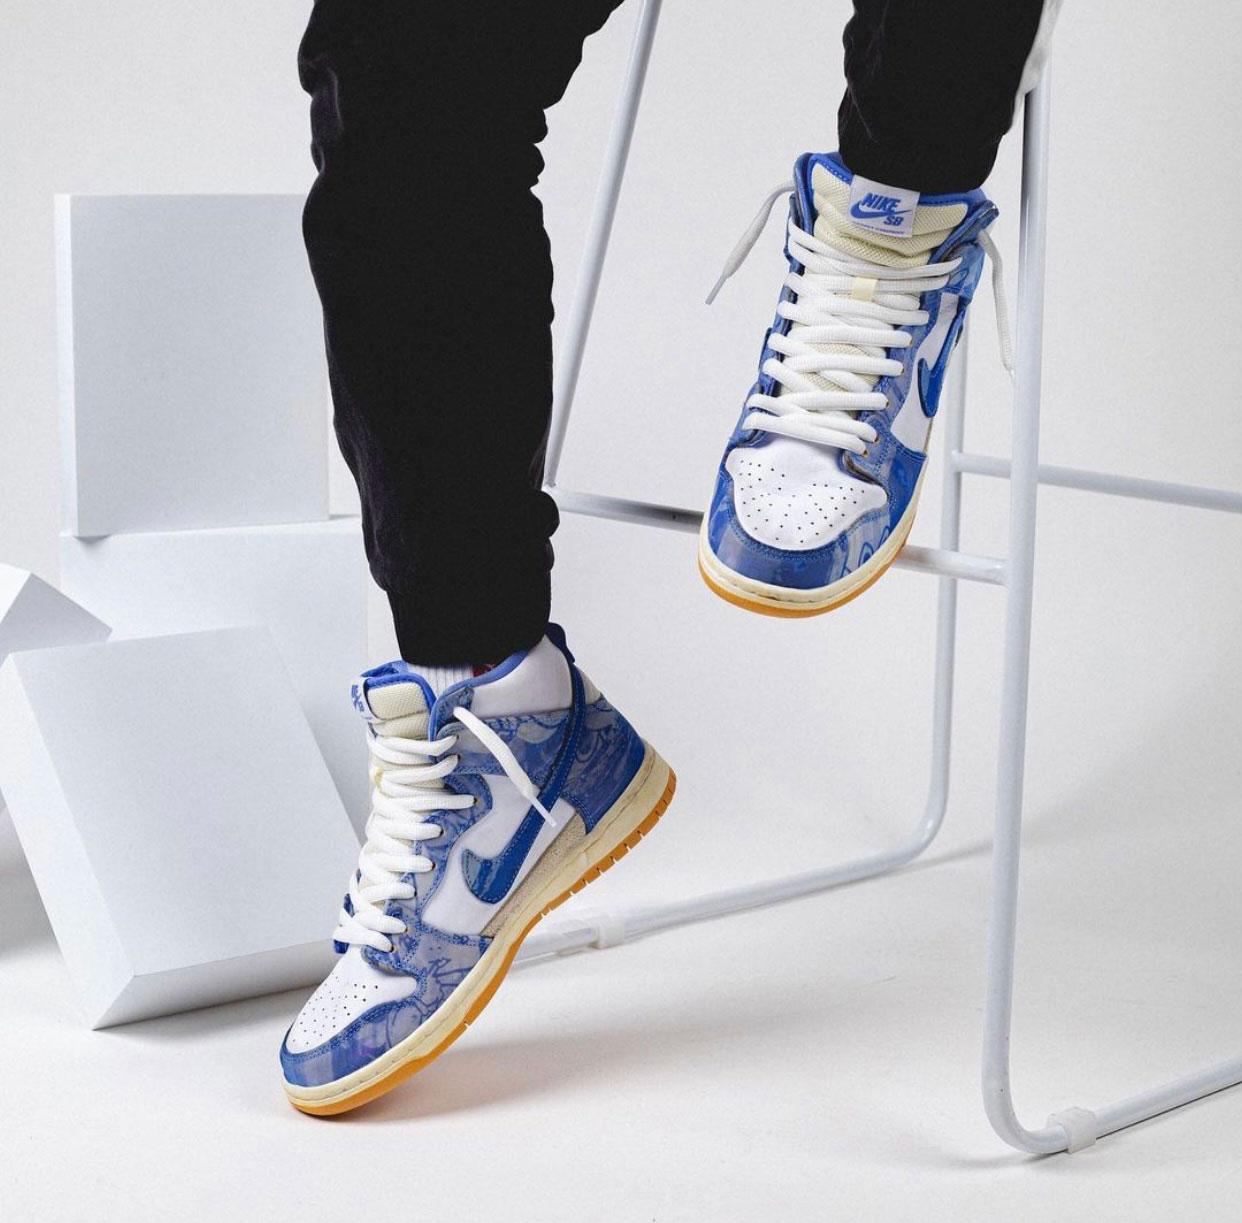 Carpet Company Nike SB Dunk High CV1677-100 On Feet